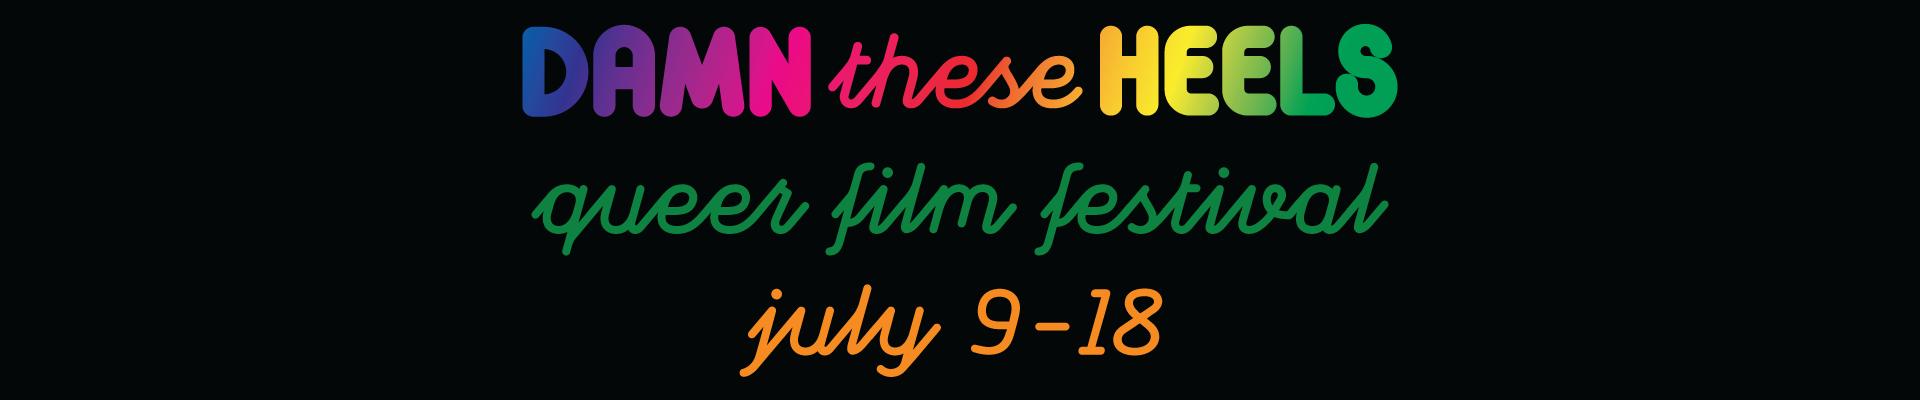 2021 Damn These Heels Queer Festival